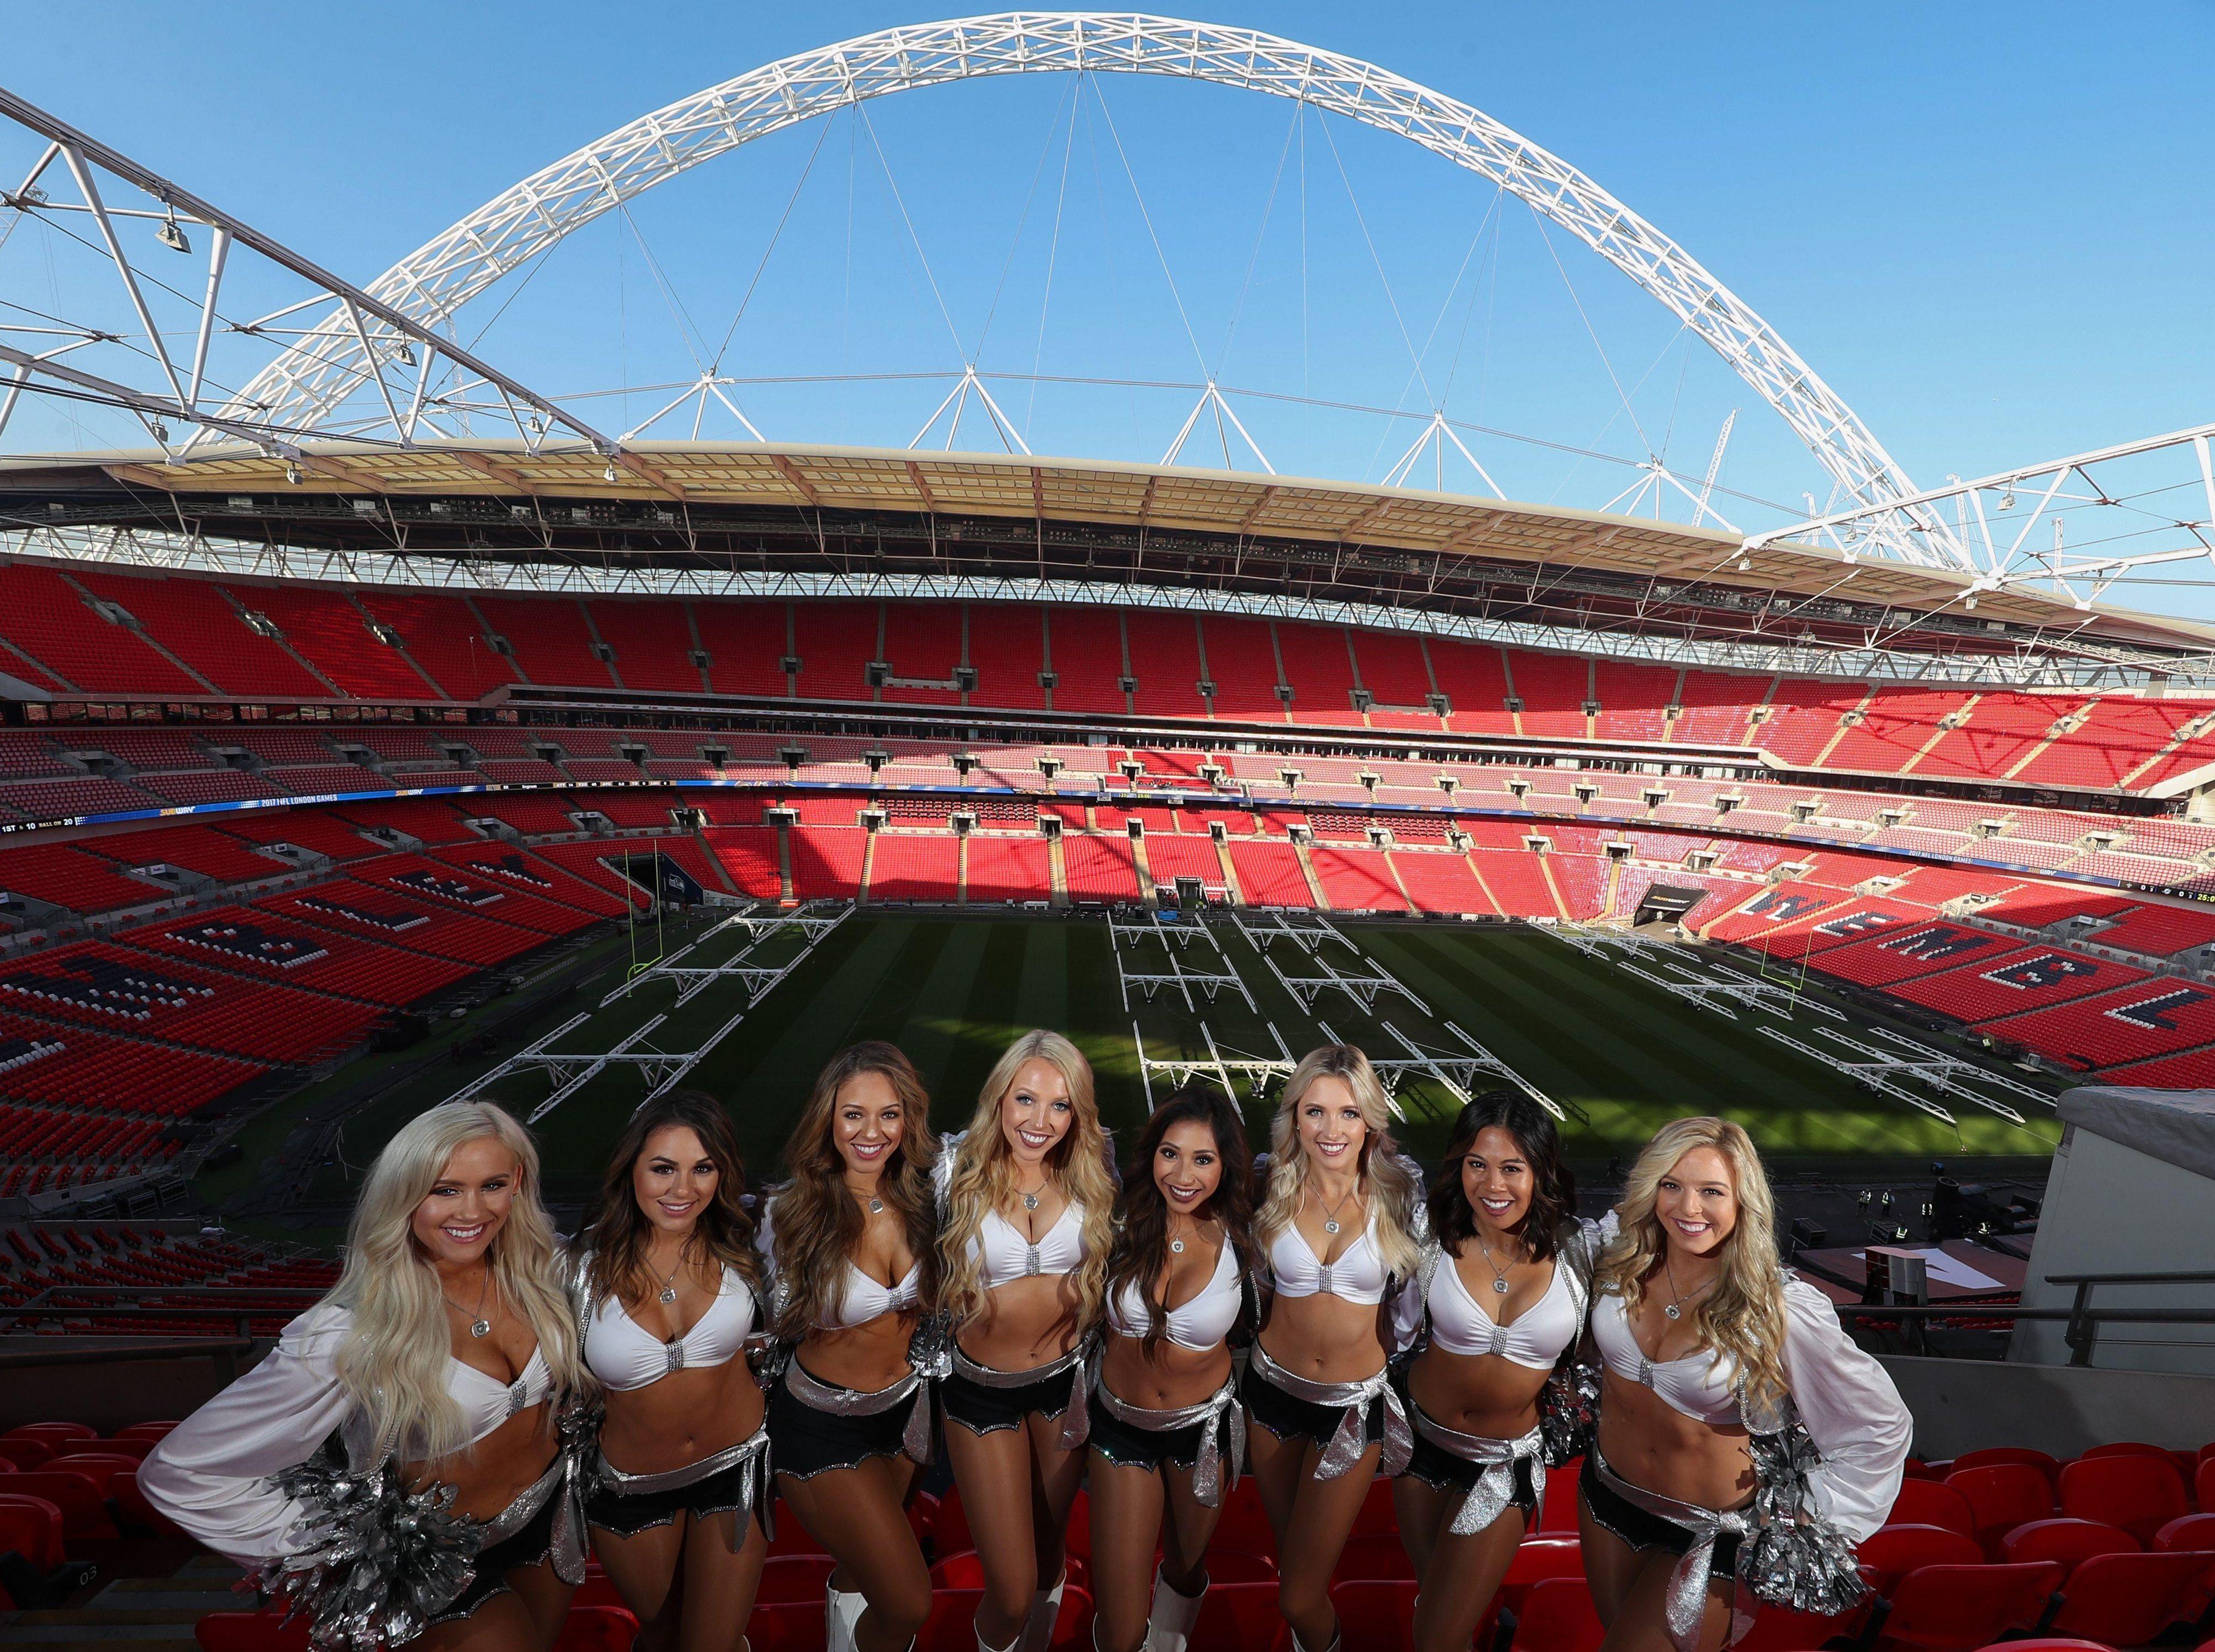 Oakland Raiders cheerleaders head to Wembley ahead of their team's clash against the Seattle Seahawks